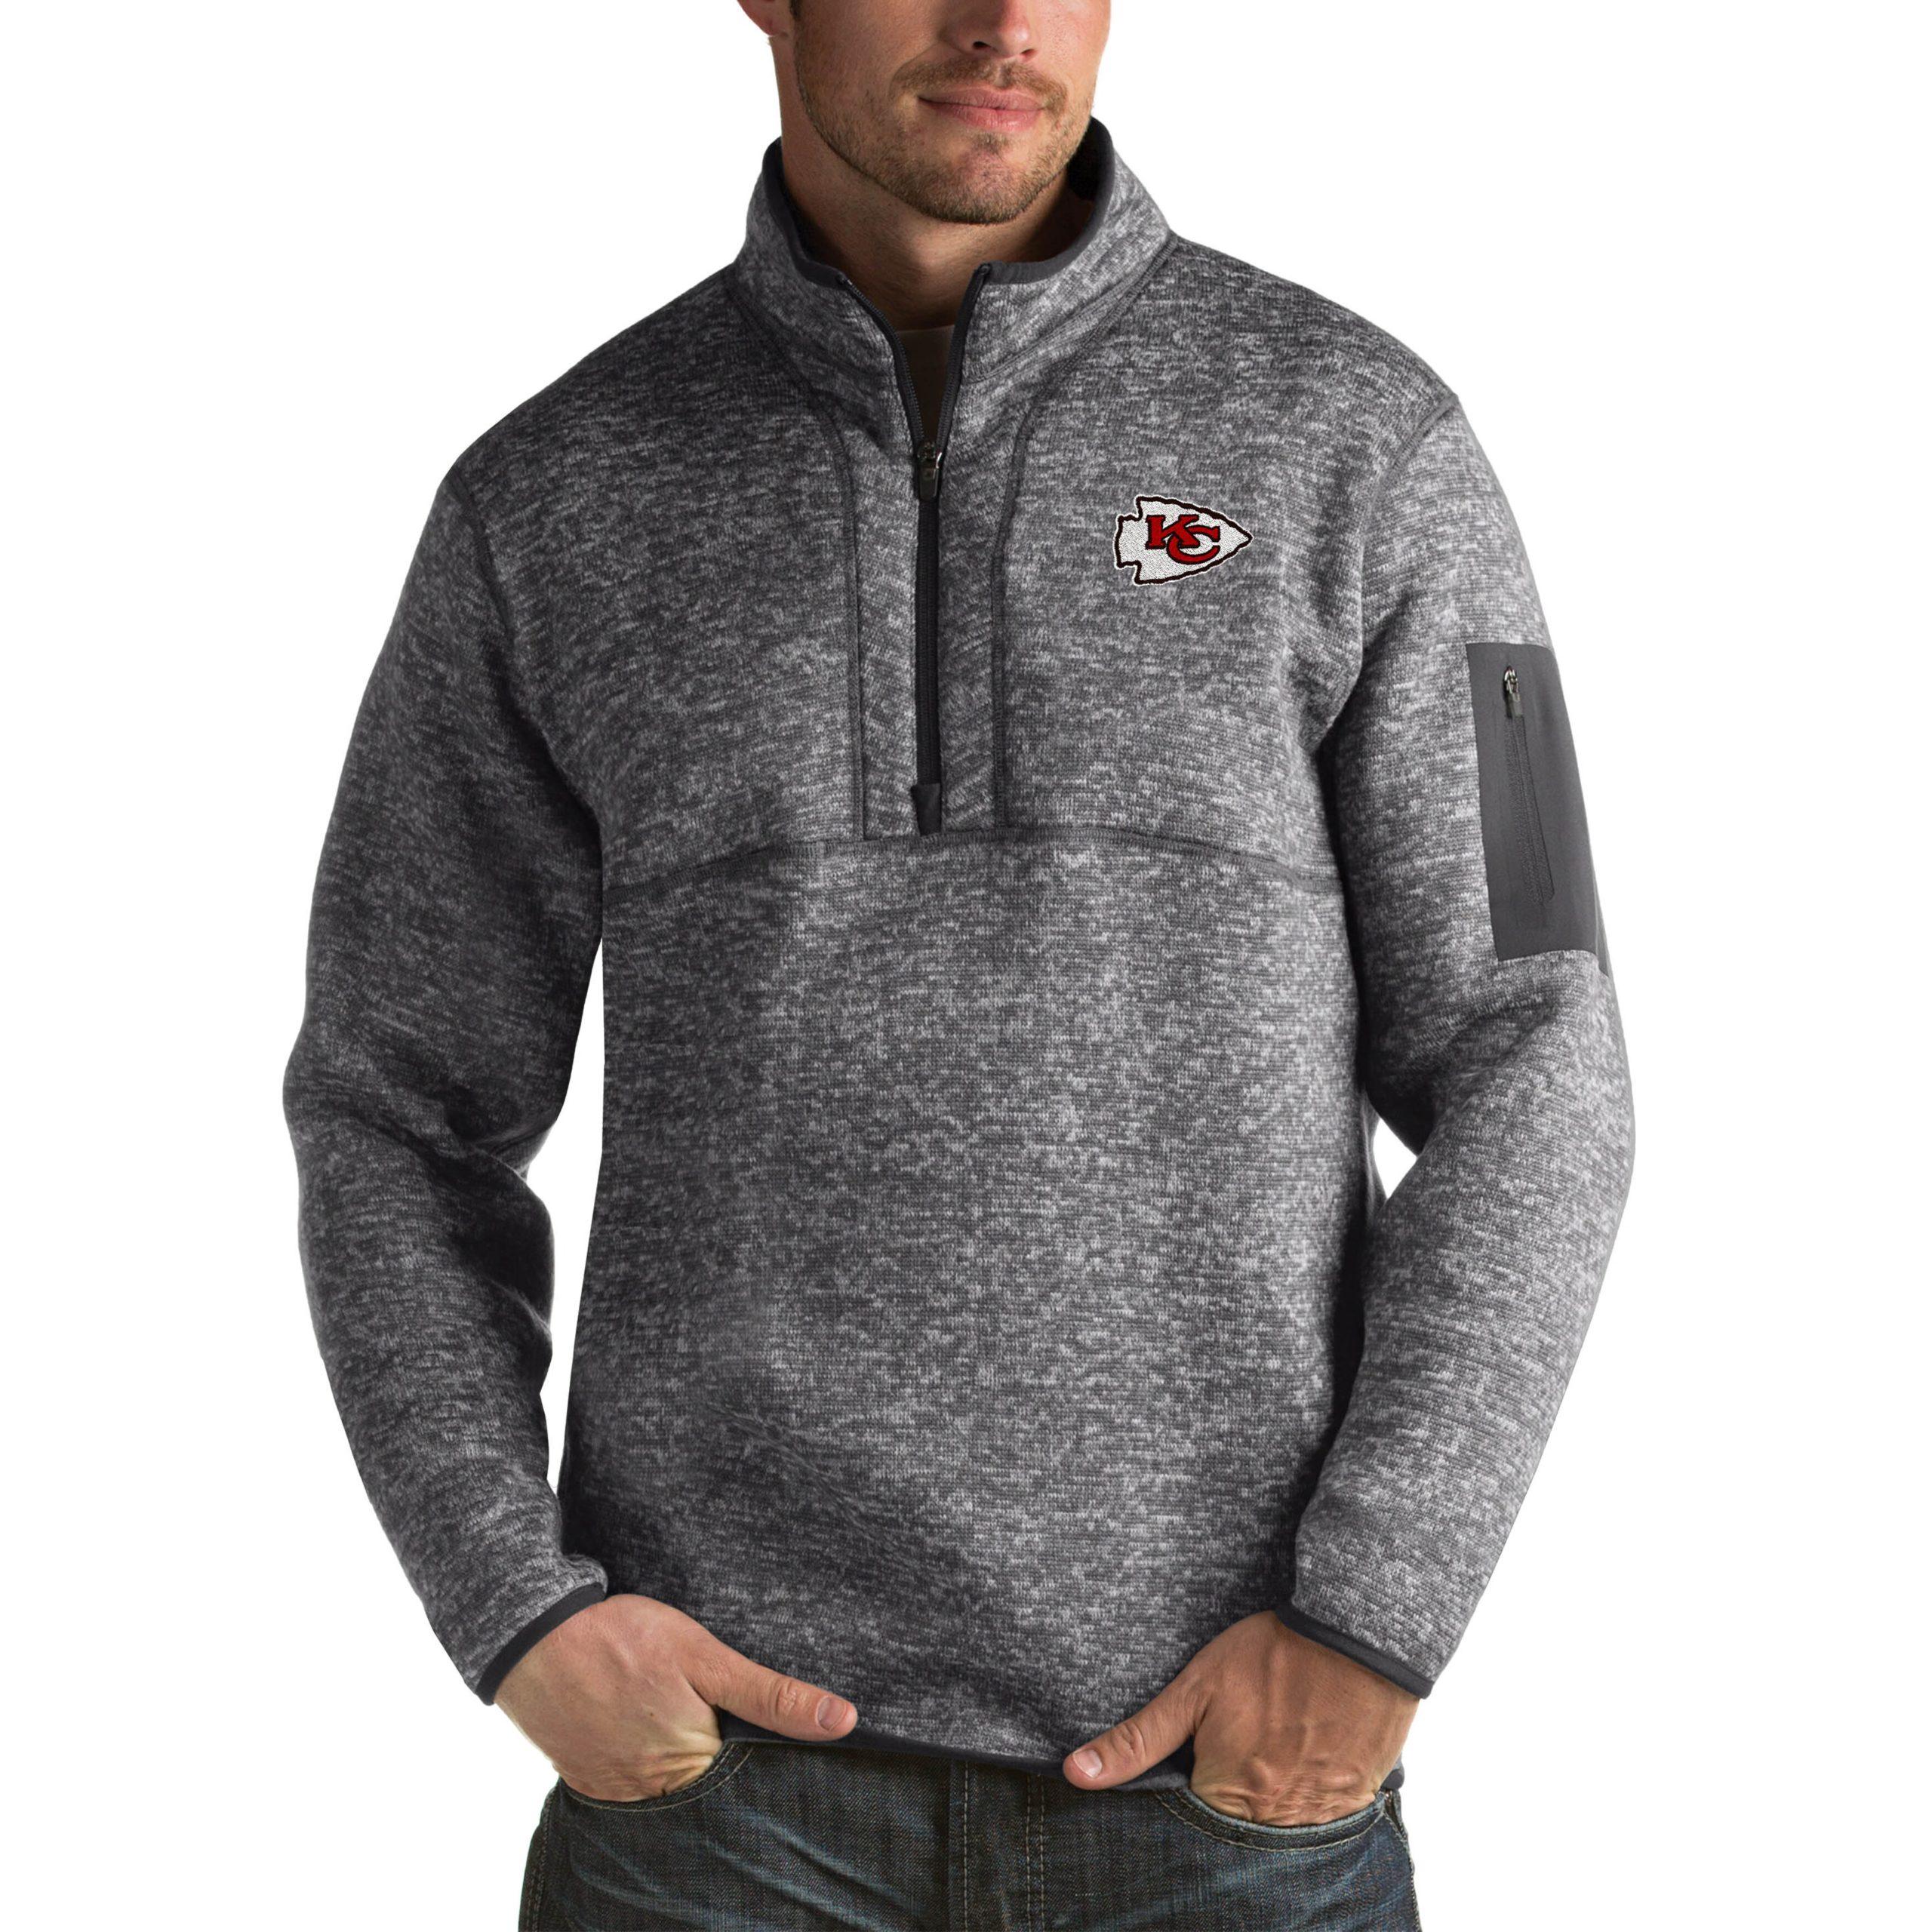 Kansas City Chiefs Antigua Fortune Big & Tall Quarter-Zip Pullover Jacket - Charcoal